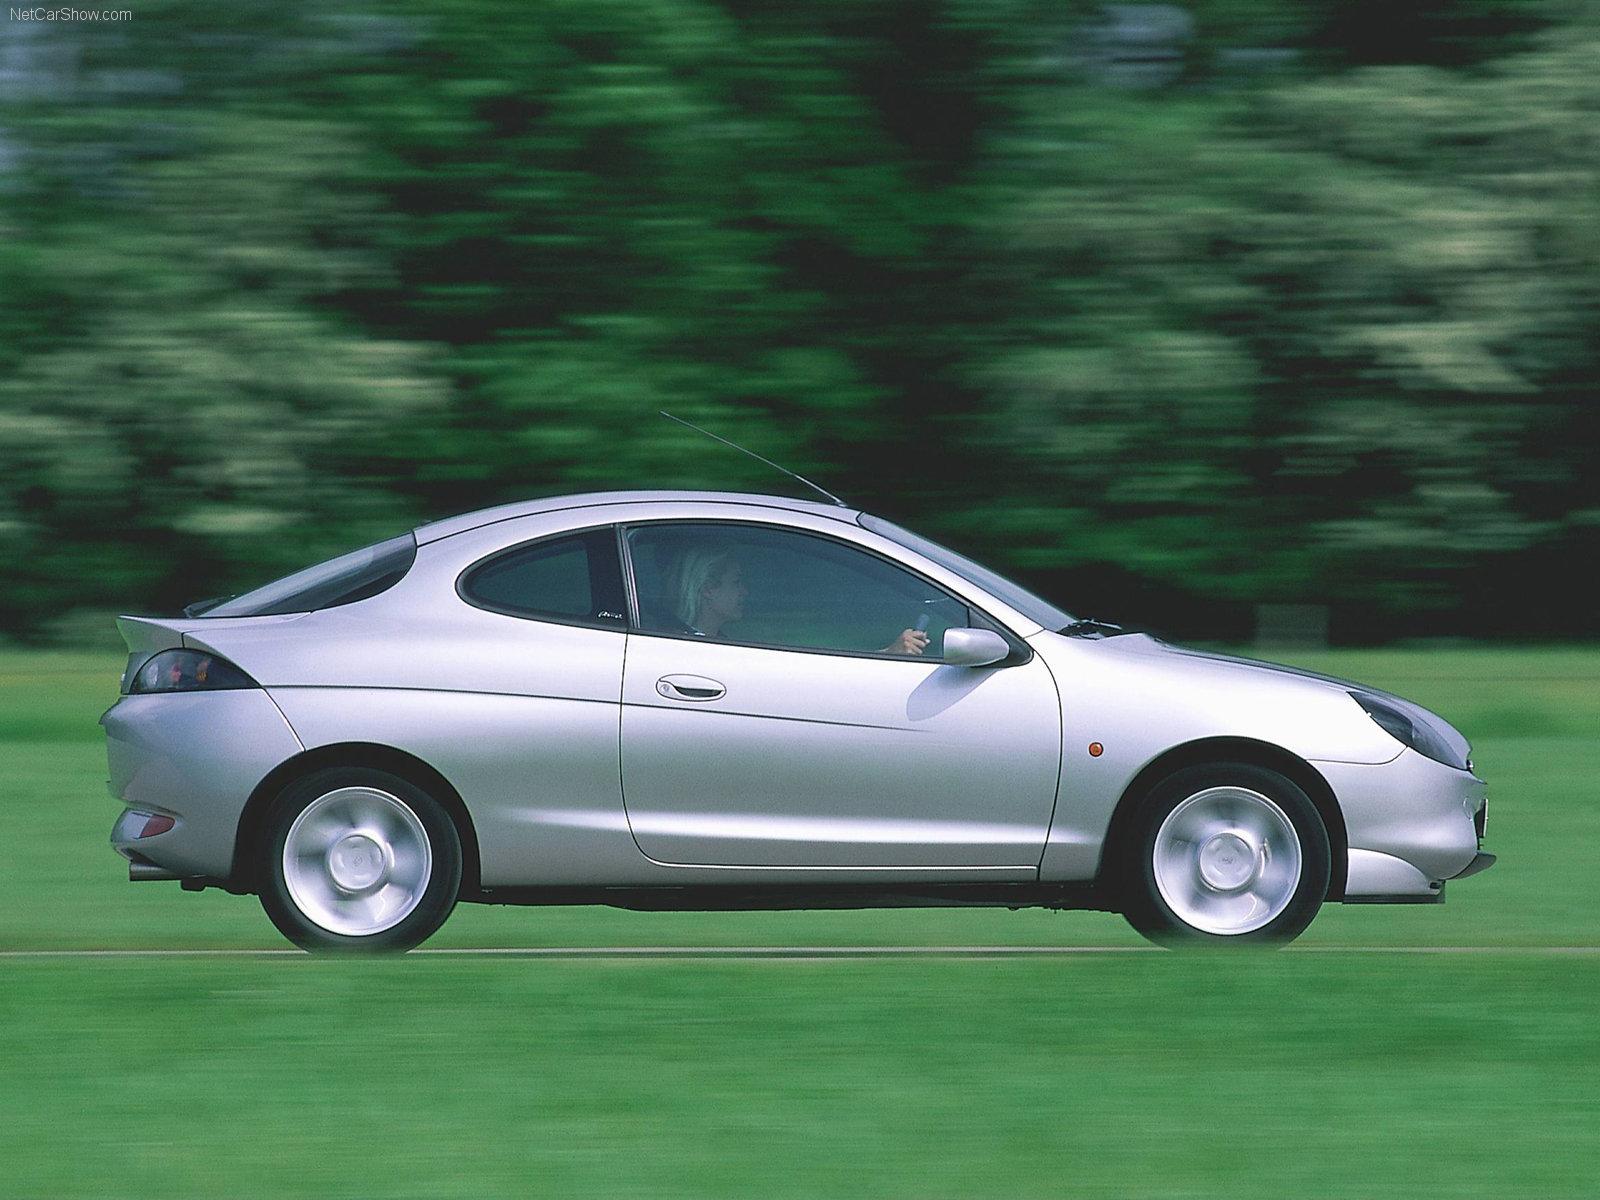 Ford Puma photos - PhotoGallery with 29 pics| CarsBase.com